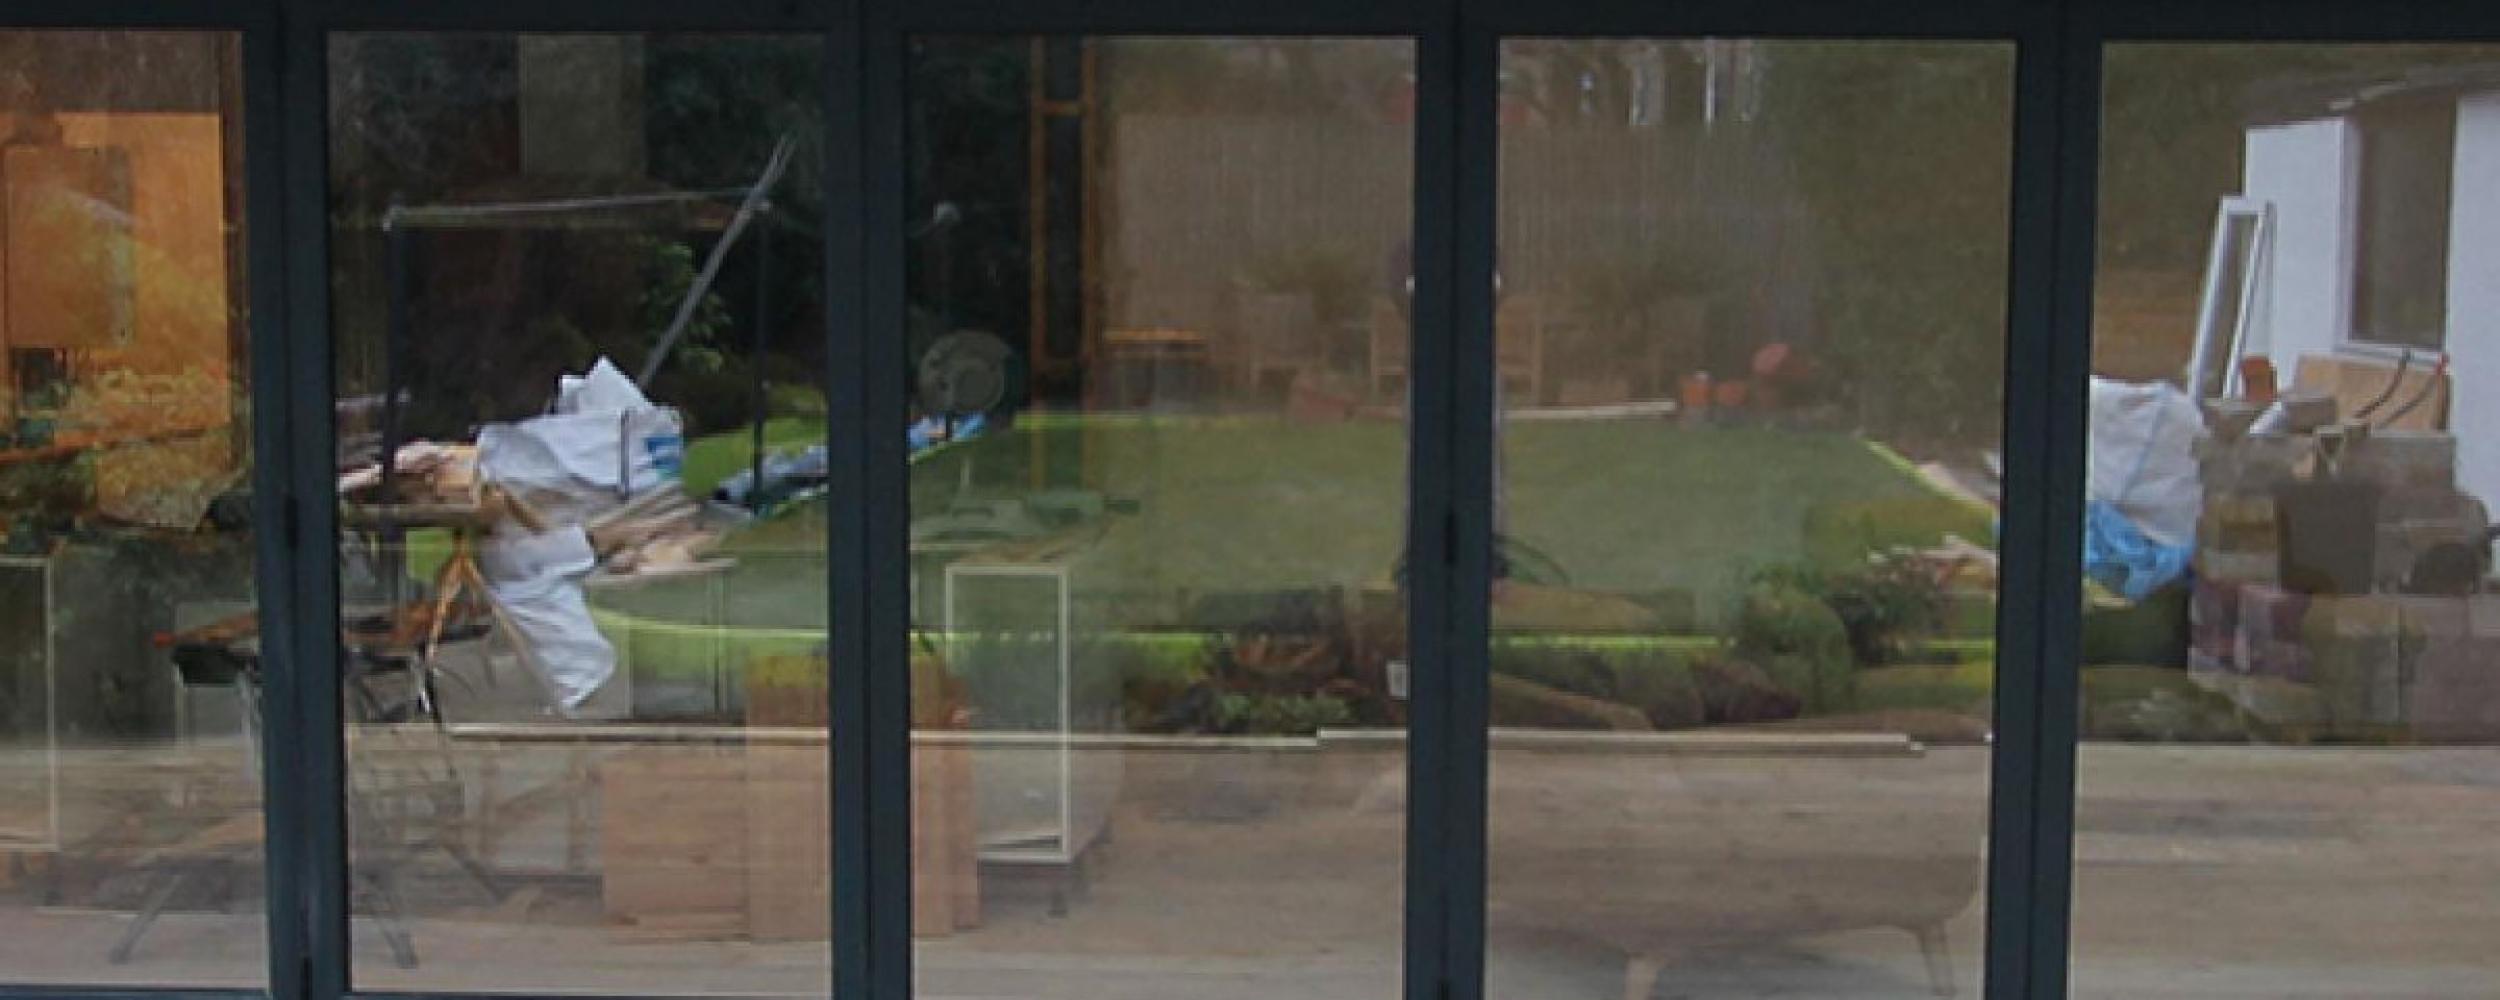 bi folding doors from EKCO